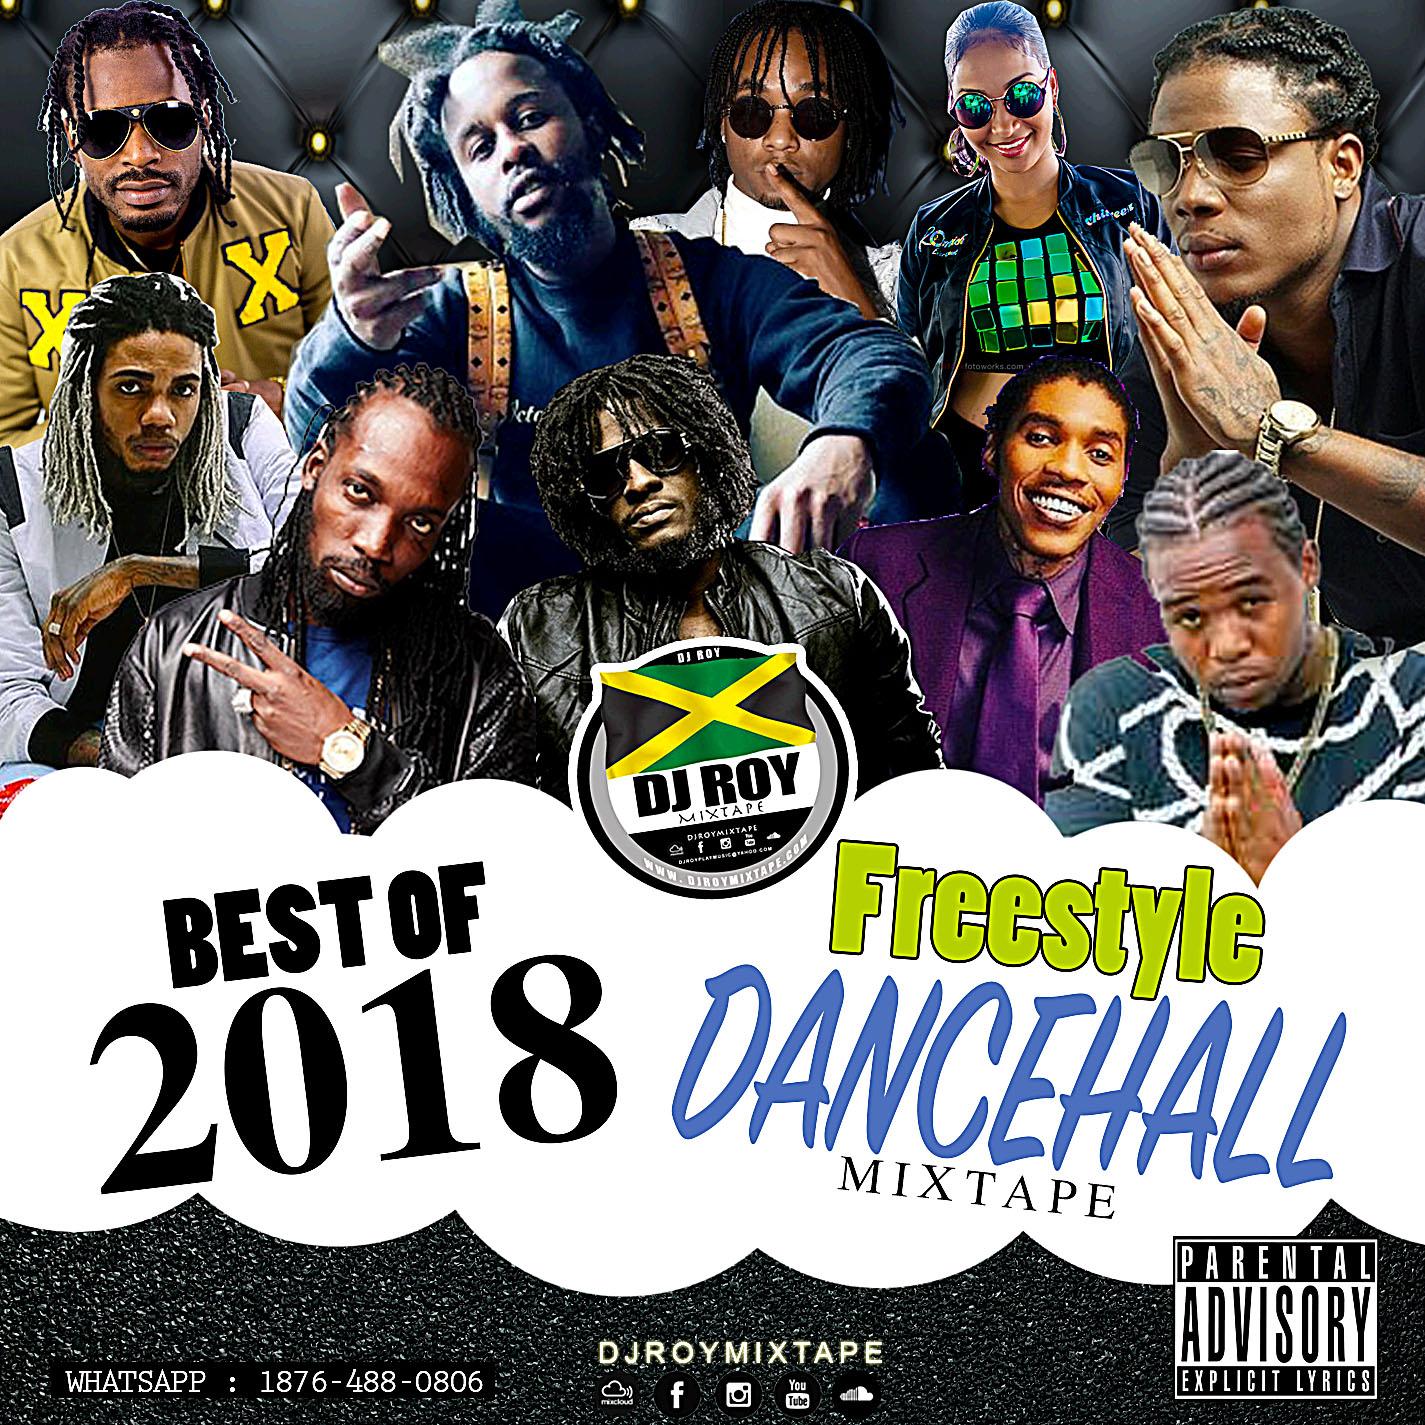 DJROYMIXTAPE : DJ ROY BEST OF 2018 FREESTYLE DANCEHALL MIX